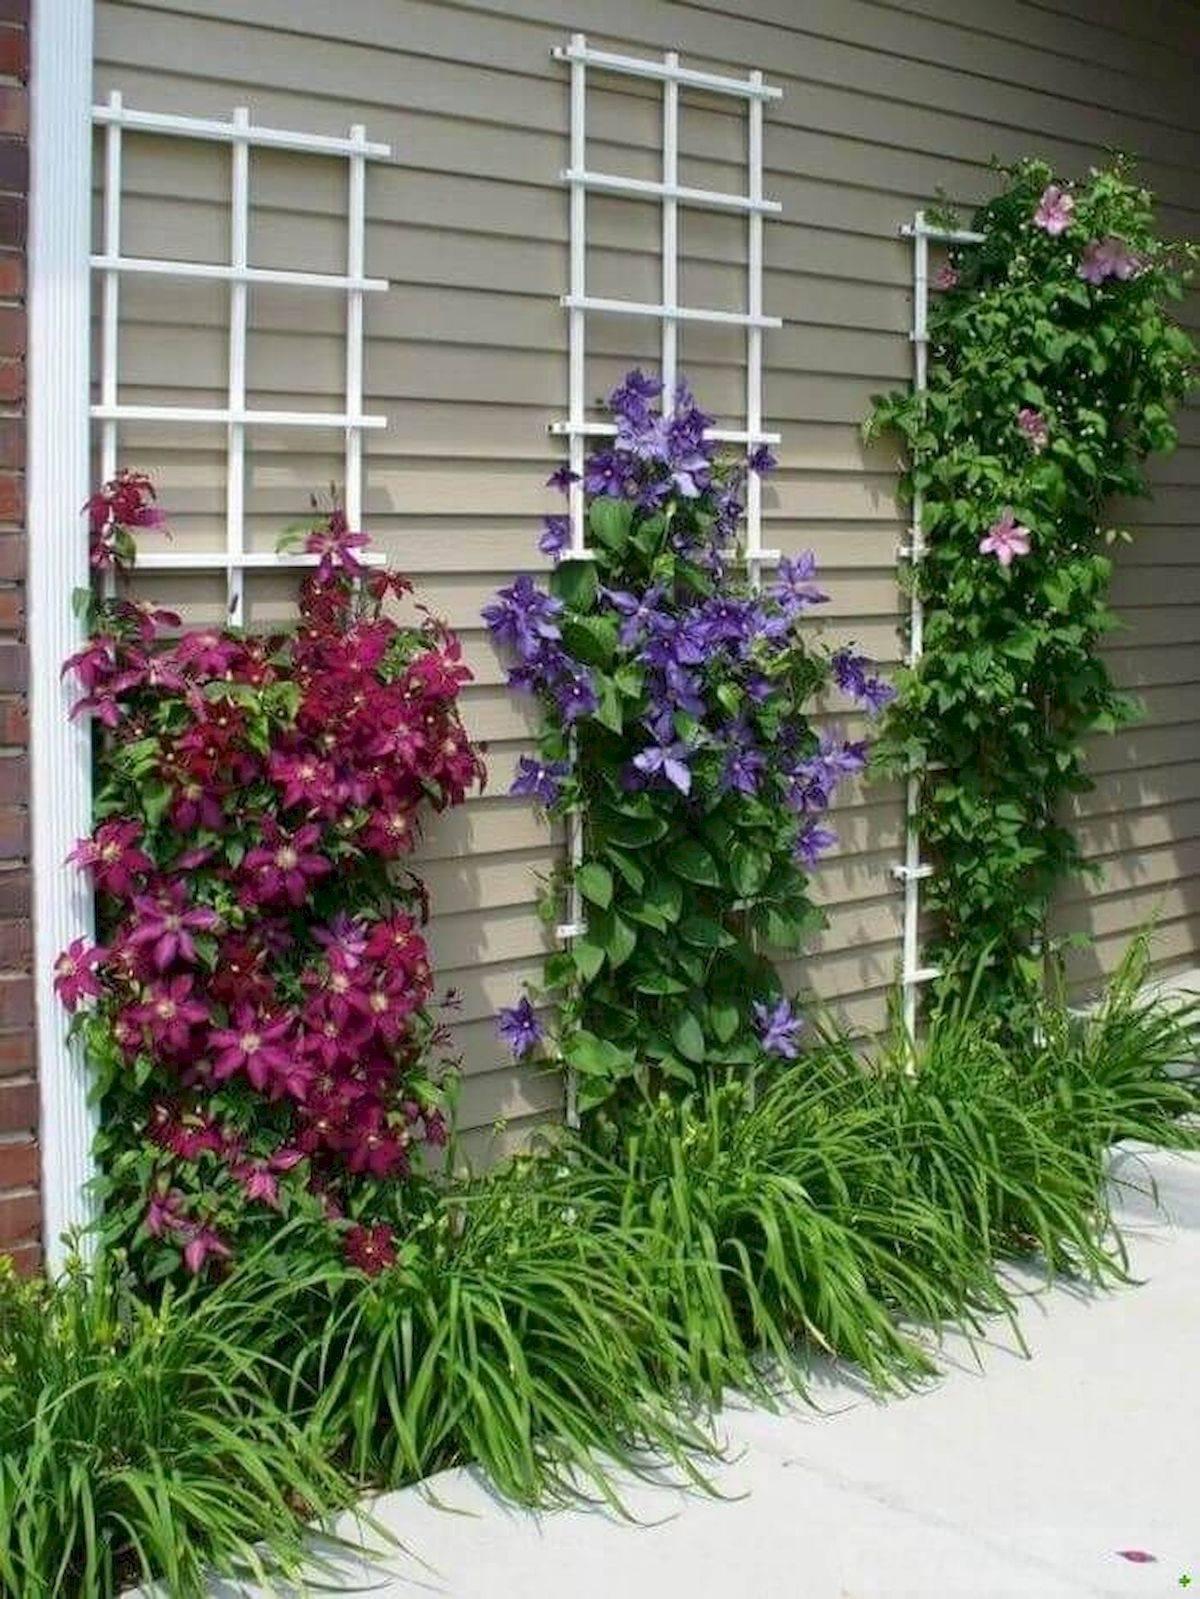 diy garden easy-692498880183736945